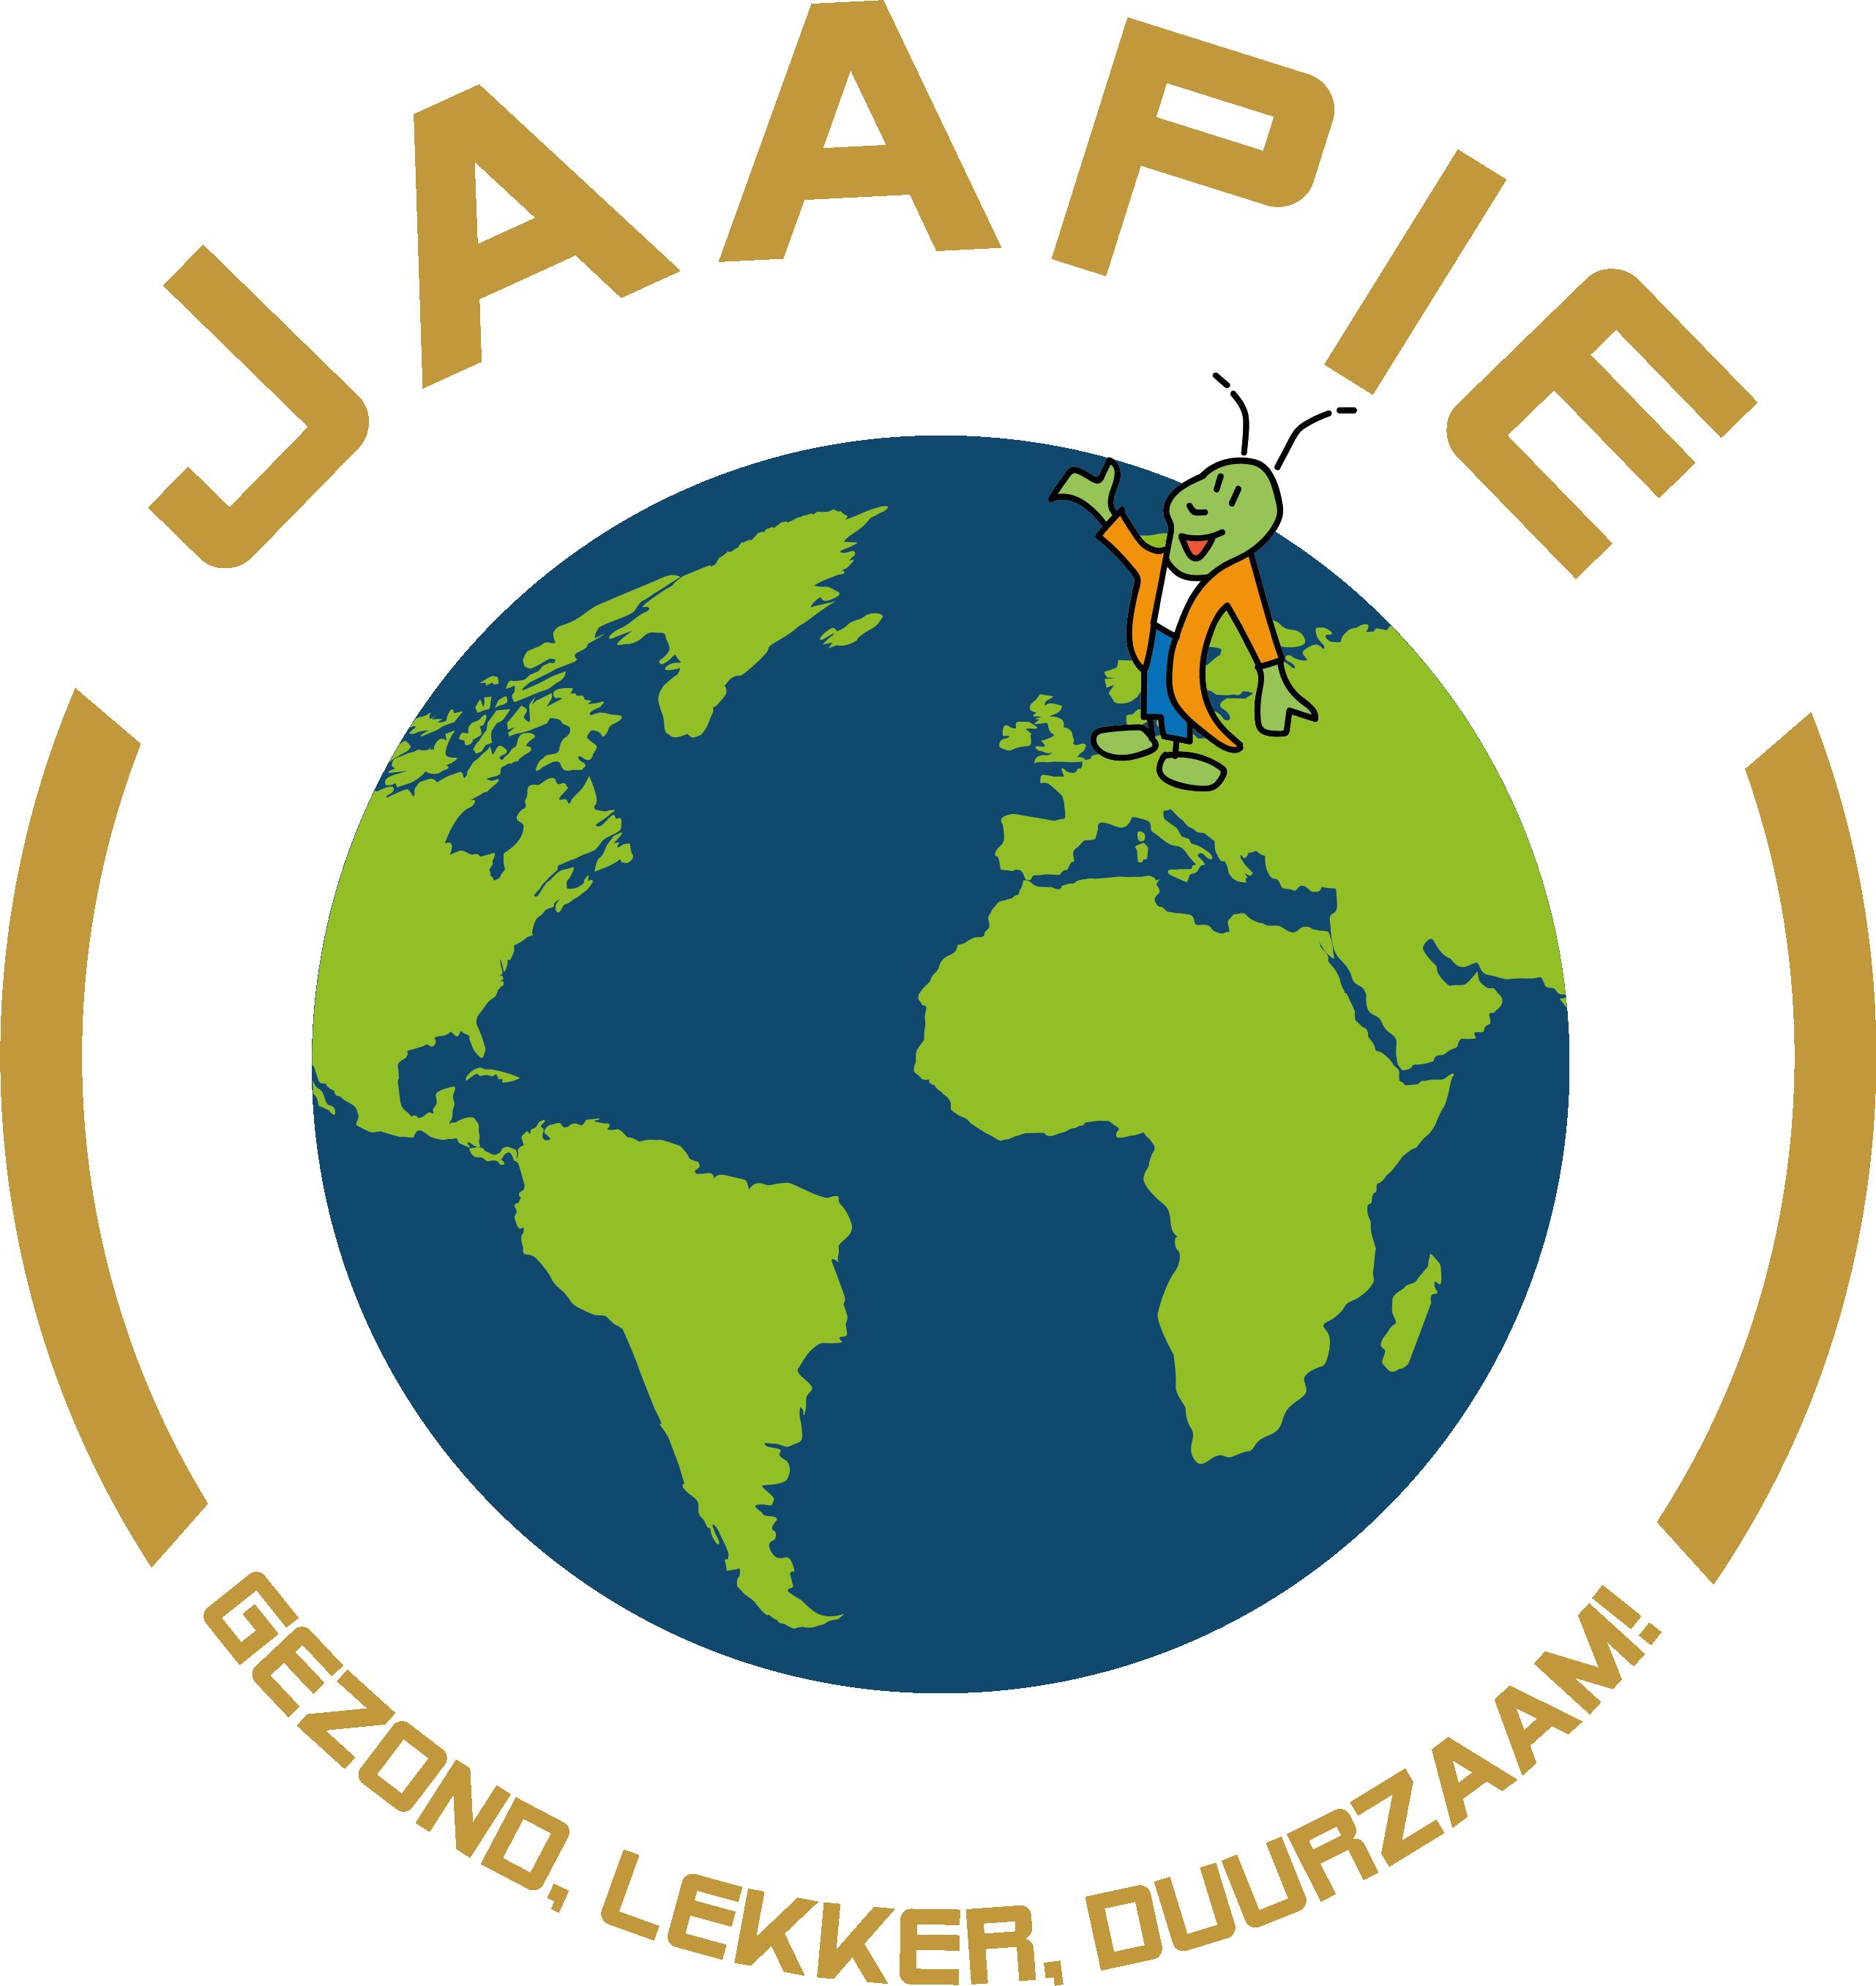 JAAPIE krekelburger logo